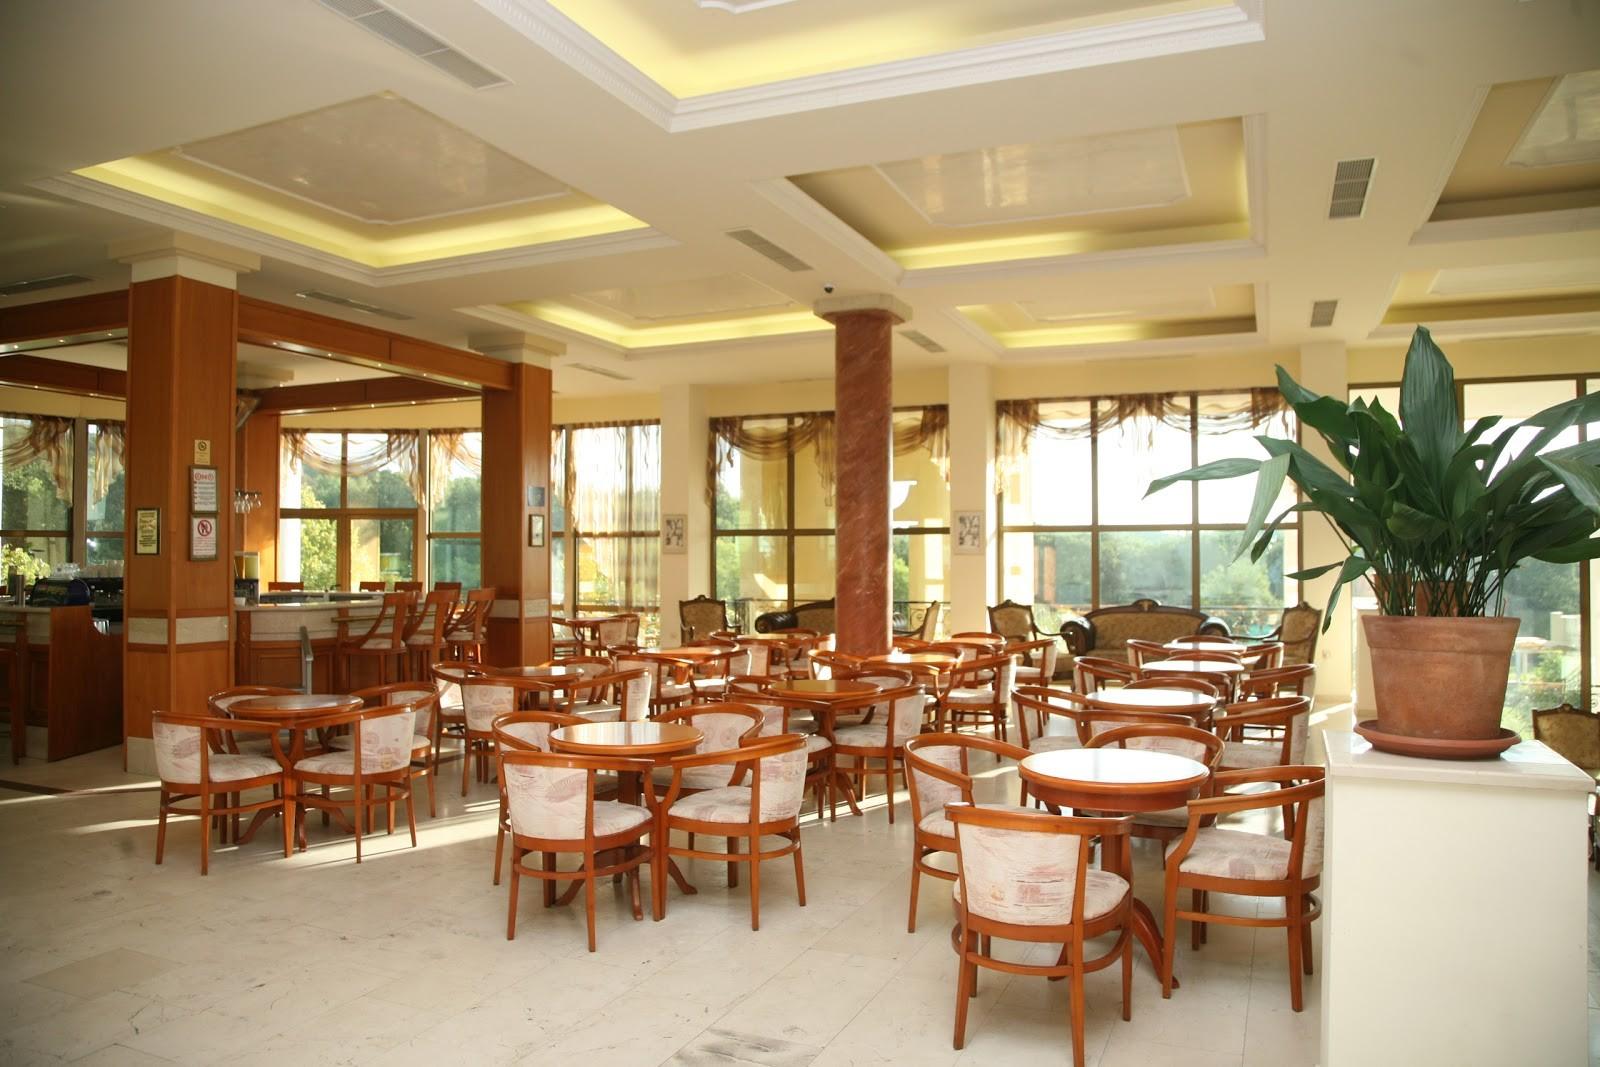 Хотел Белвил - лоби бар